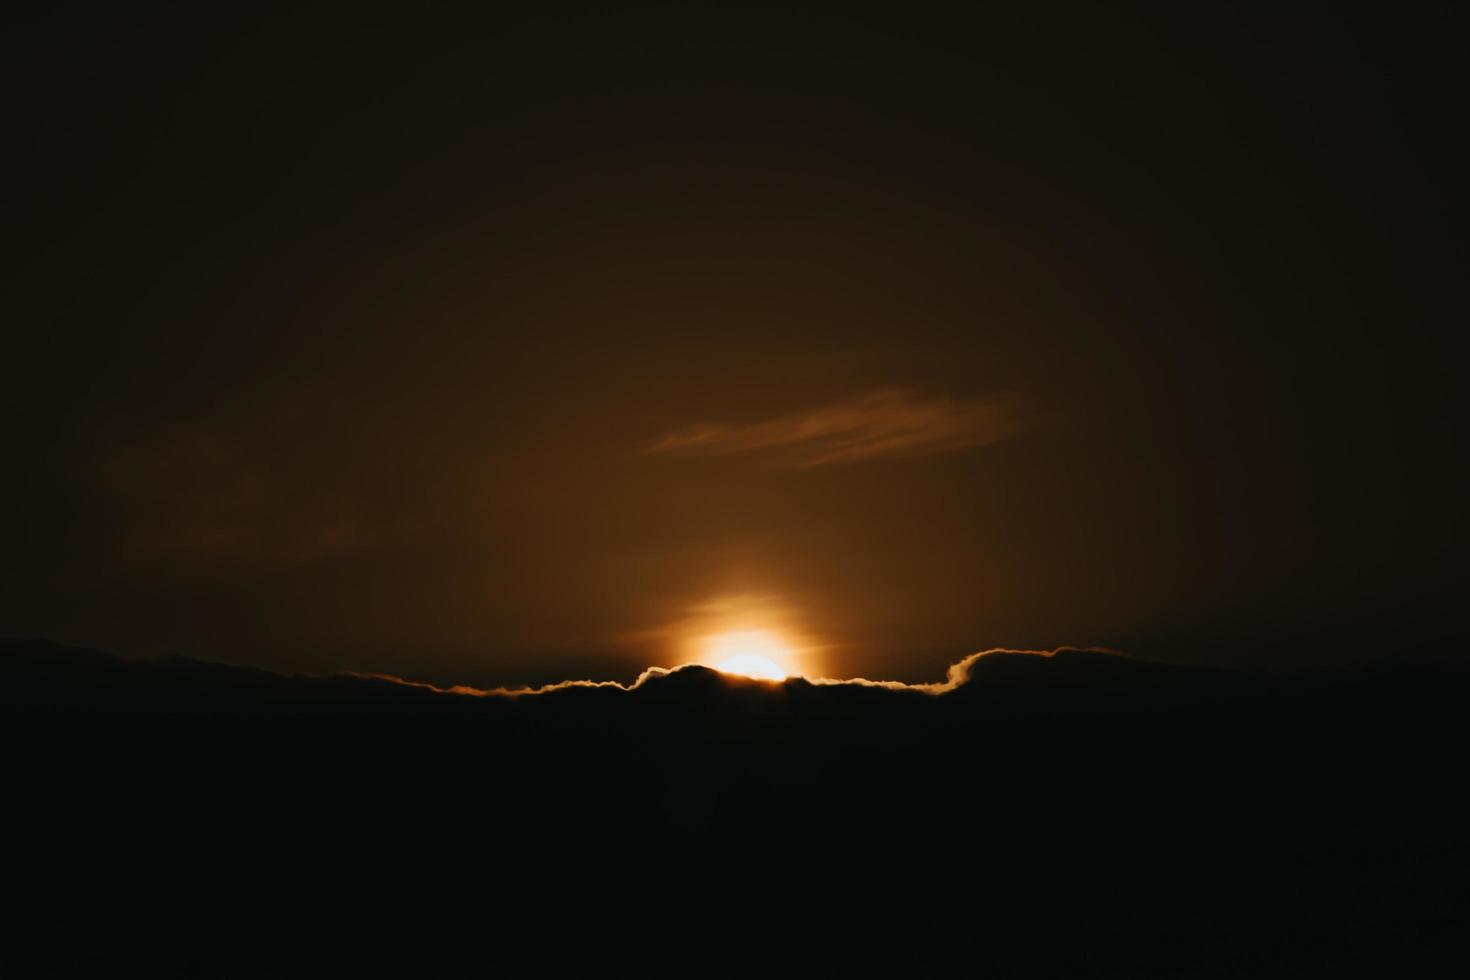 super puesta de sol sobre las nubes negras foto